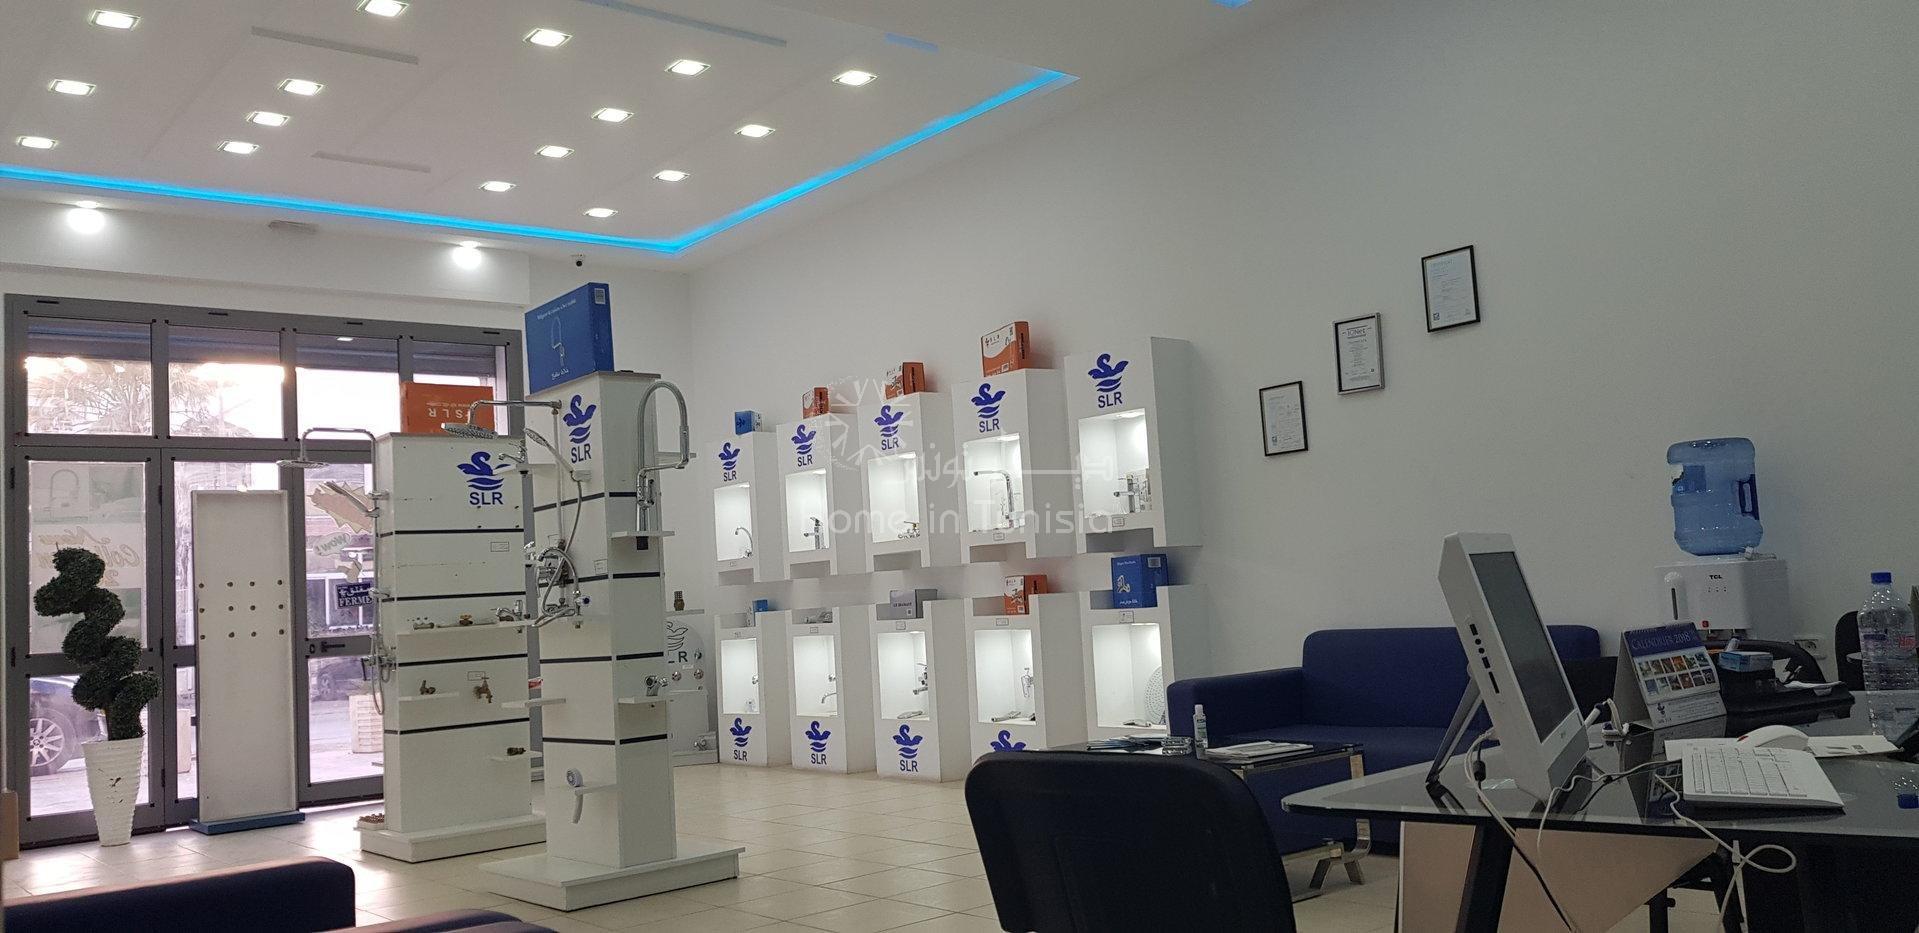 Verkoop Handelsfonds - Hammam Sousse - Tunesië